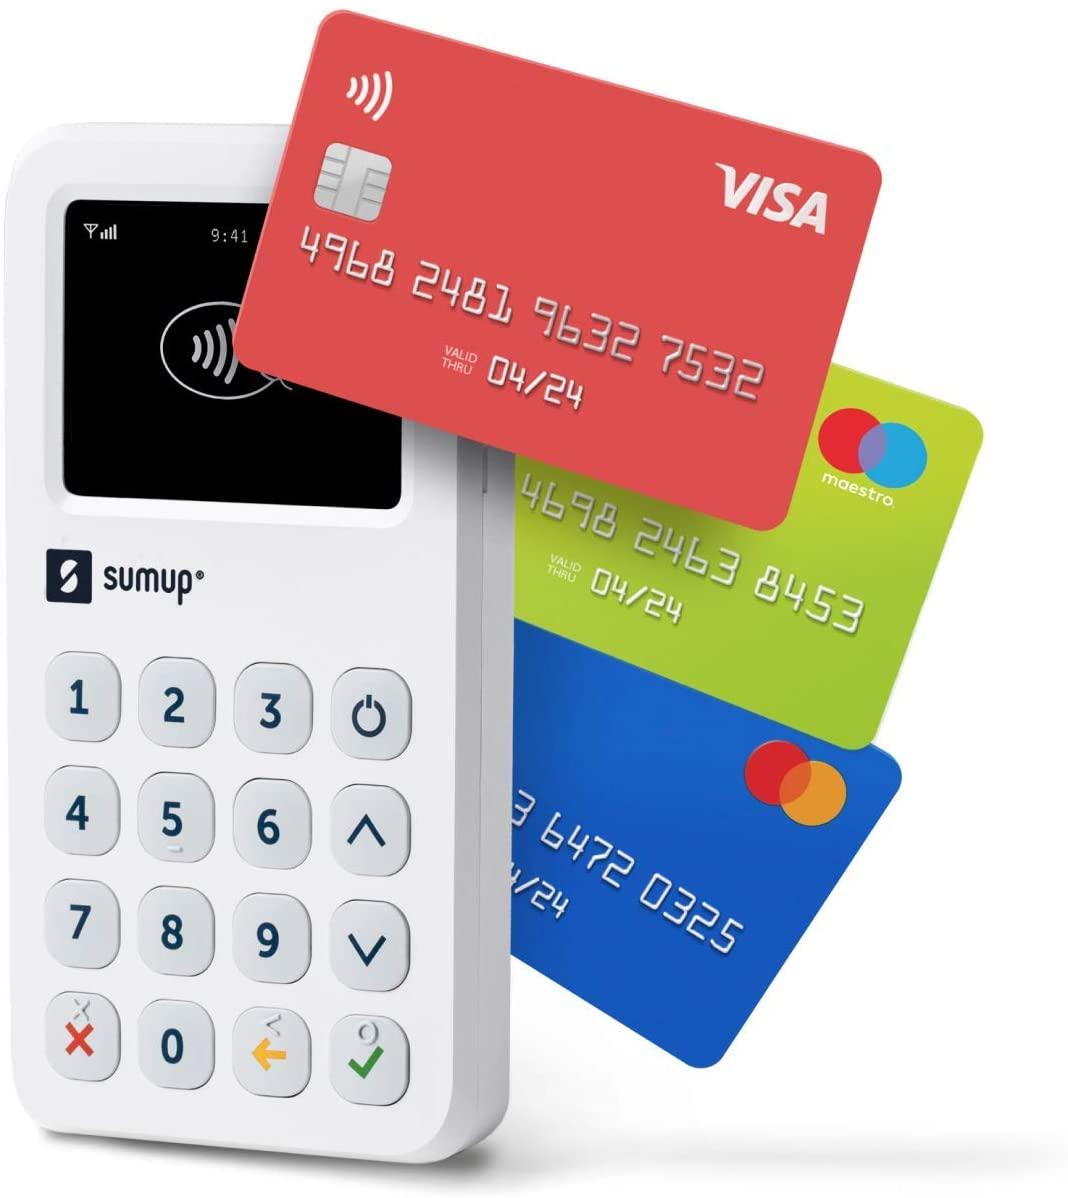 Terminal de paiement SumUp 3G + WiFi